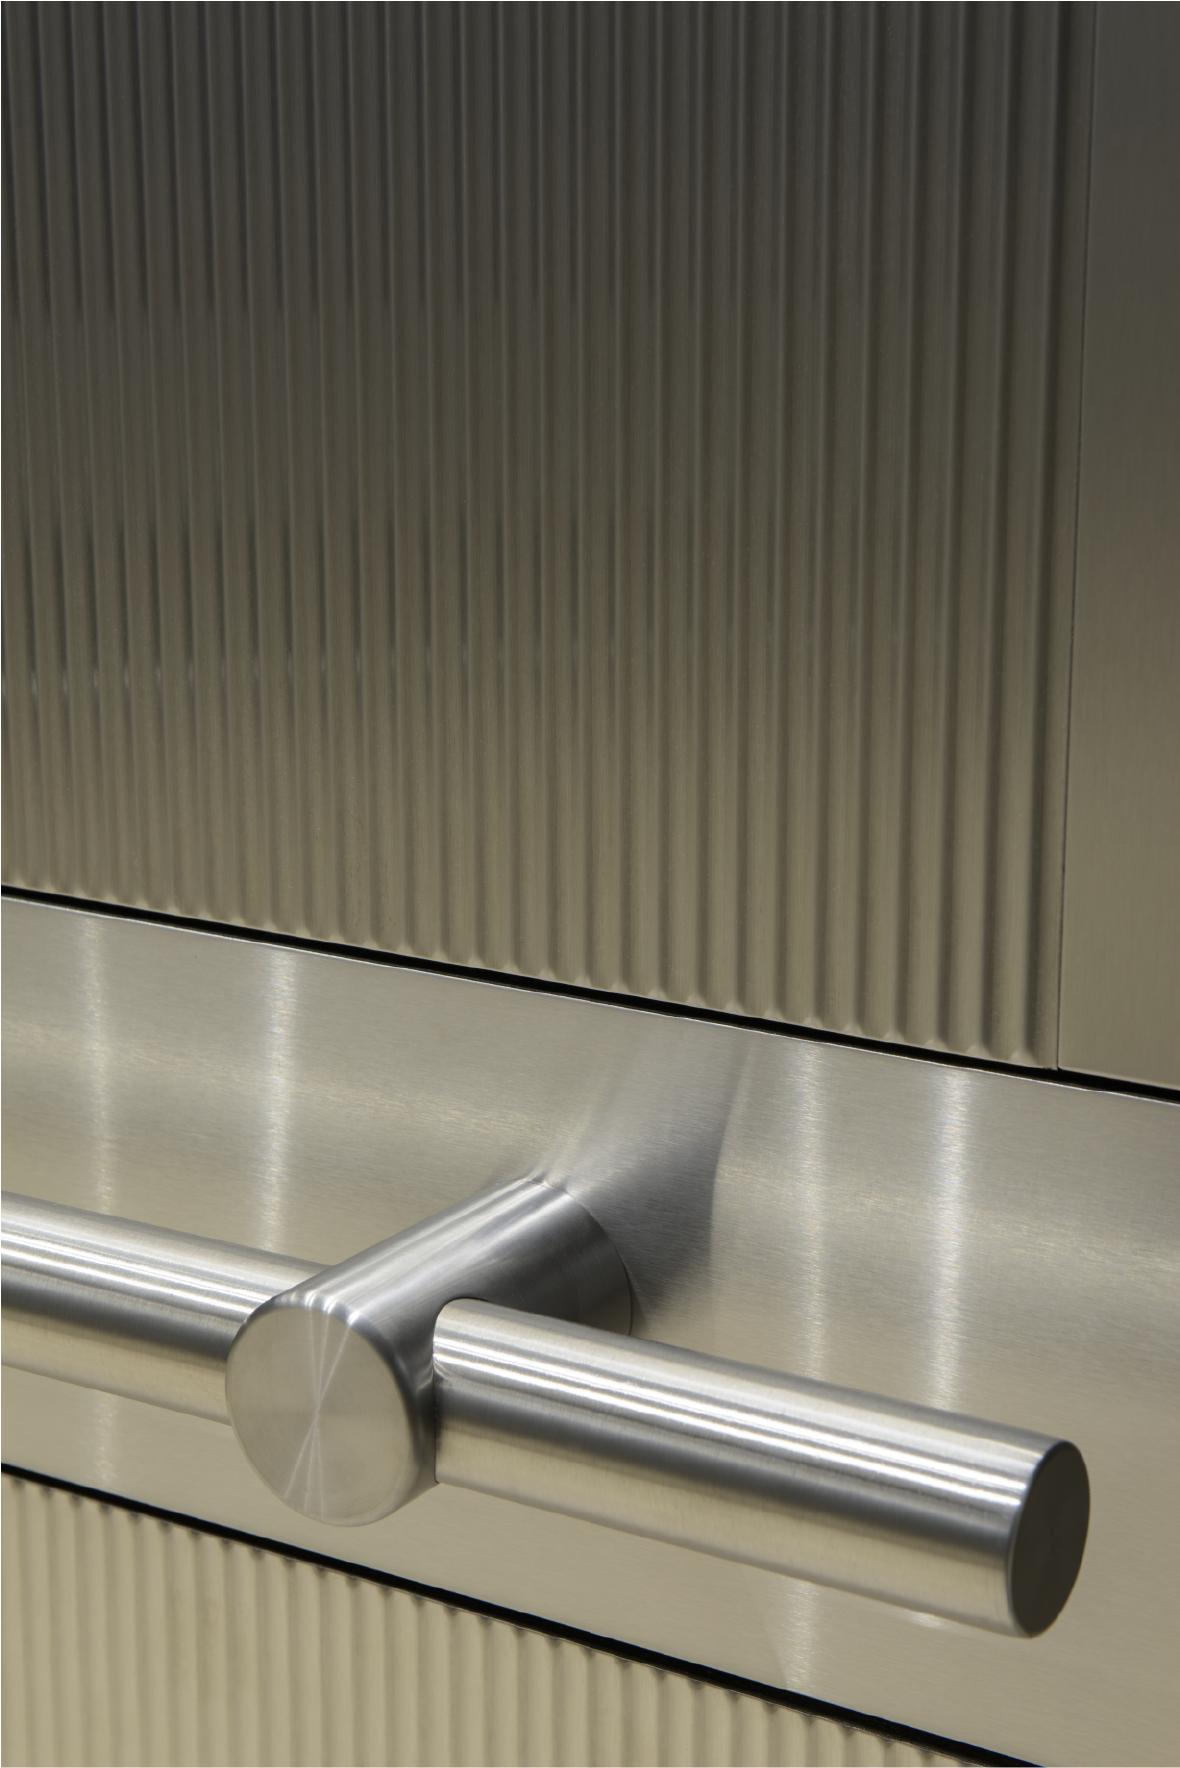 Best Brushed Stainless Steel Tubular Handrail Elevator 400 x 300